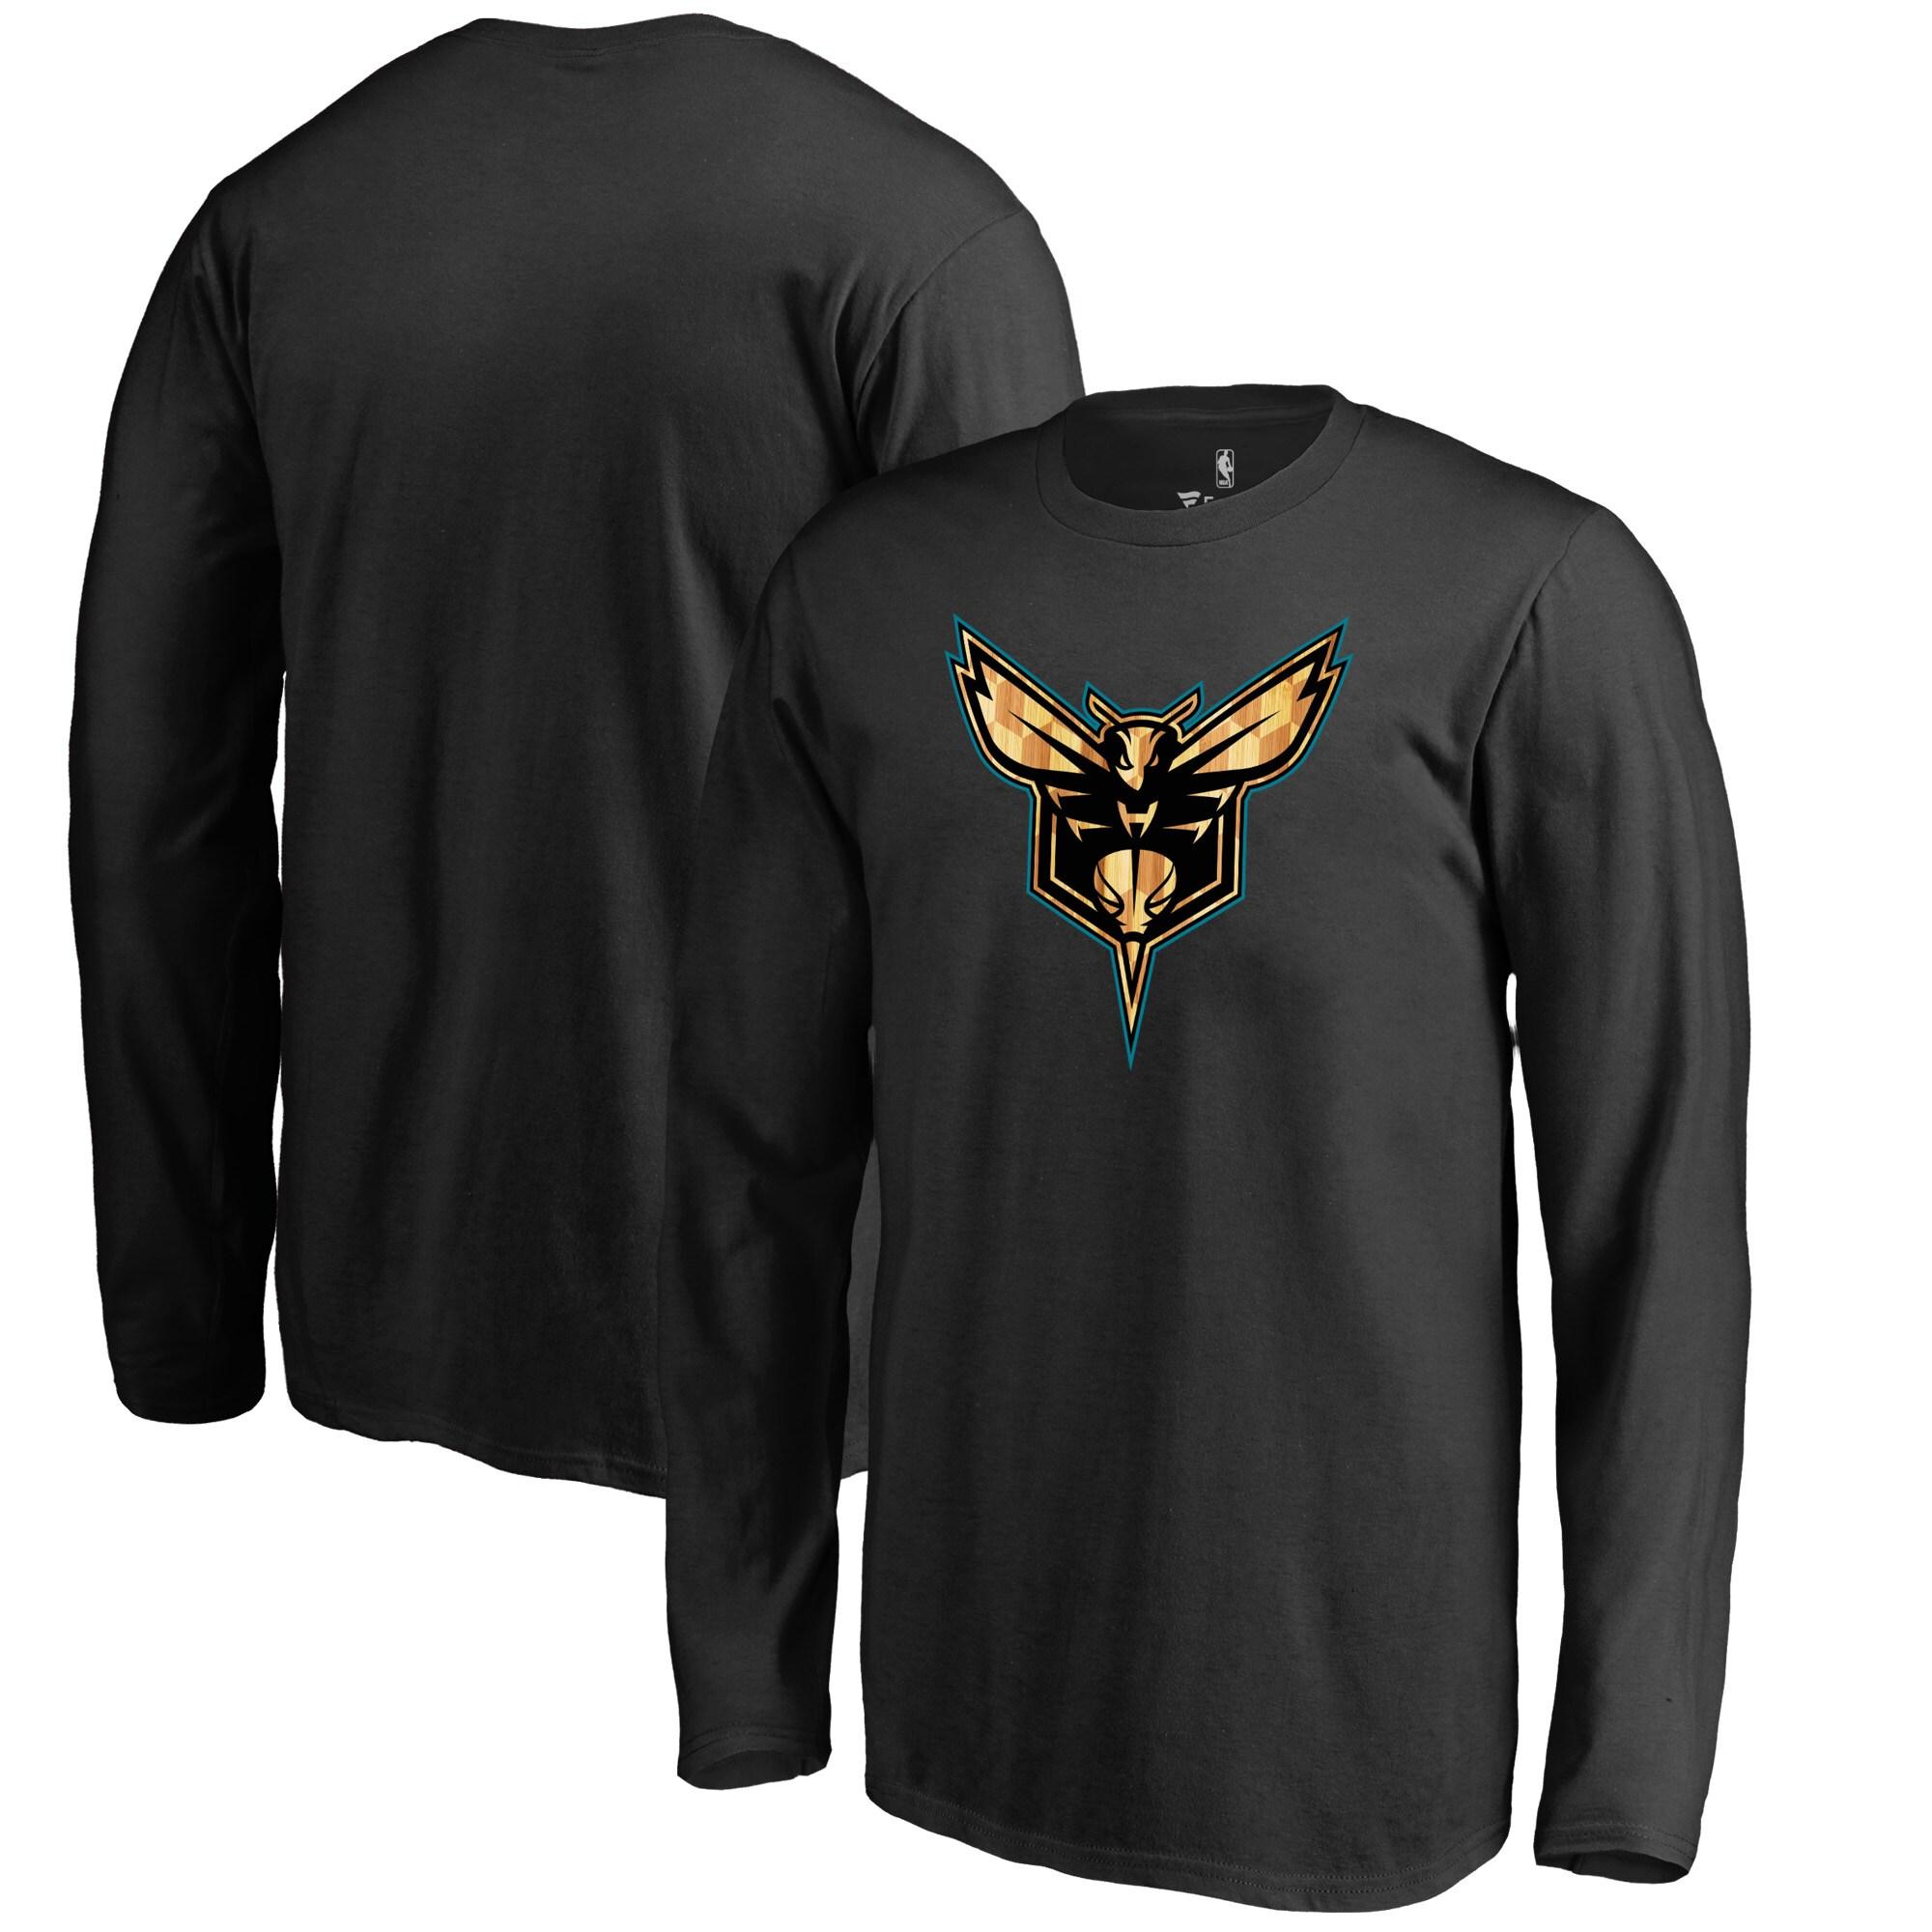 Charlotte Hornets Fanatics Branded Youth Hardwood Long Sleeve T-Shirt - Black